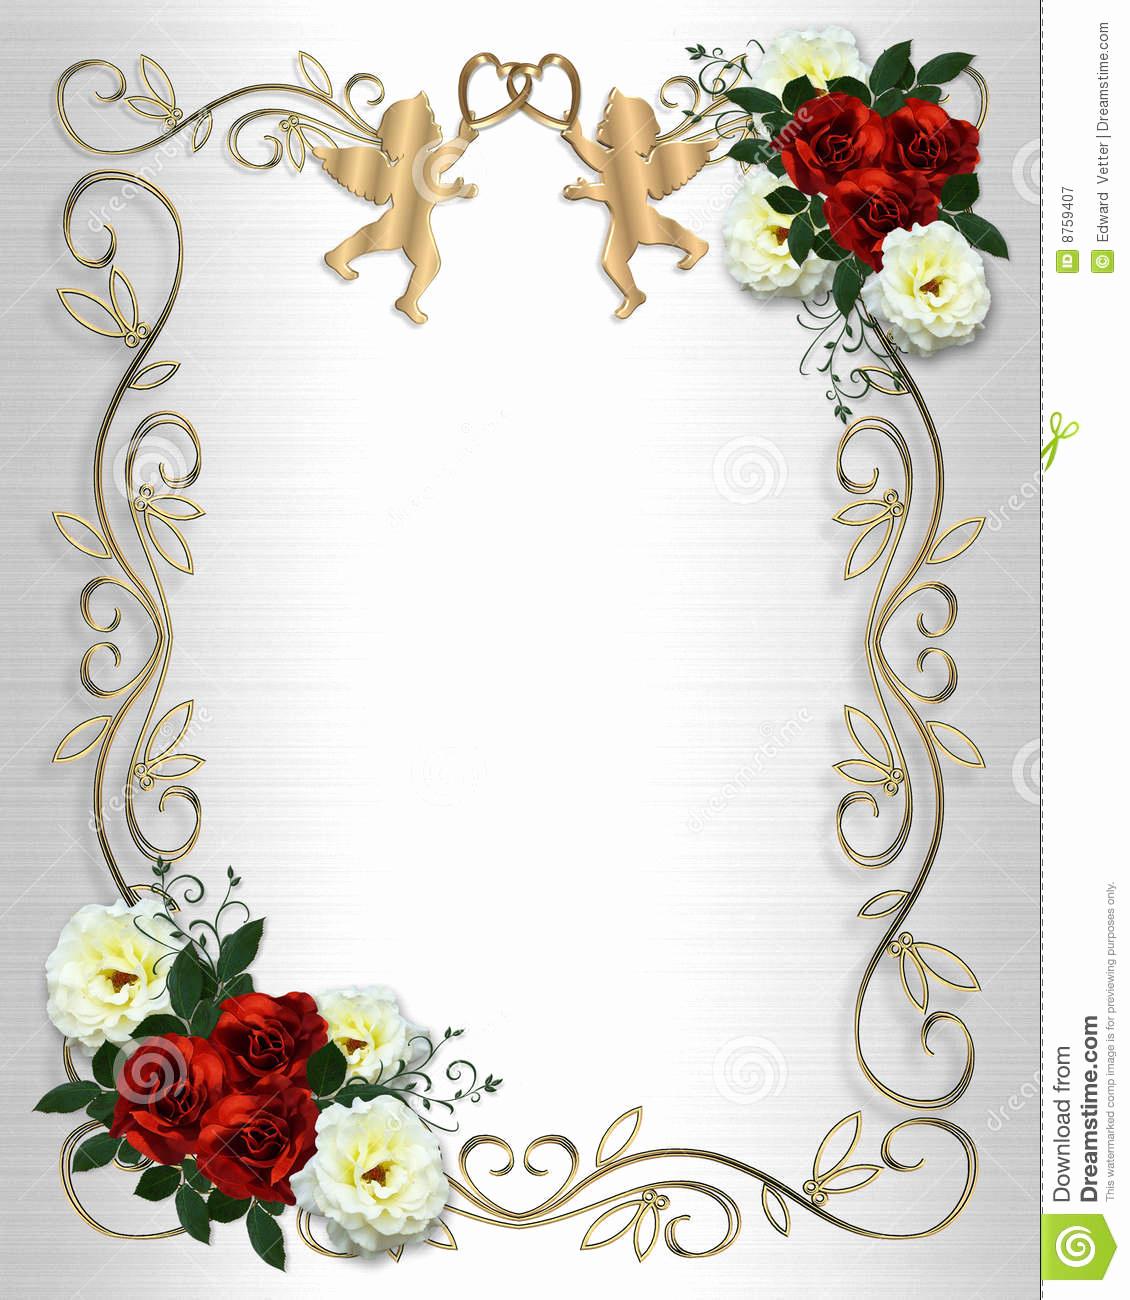 Wedding Invitation Border Designs Elegant Wedding Invitation Borders and Frames Free Download